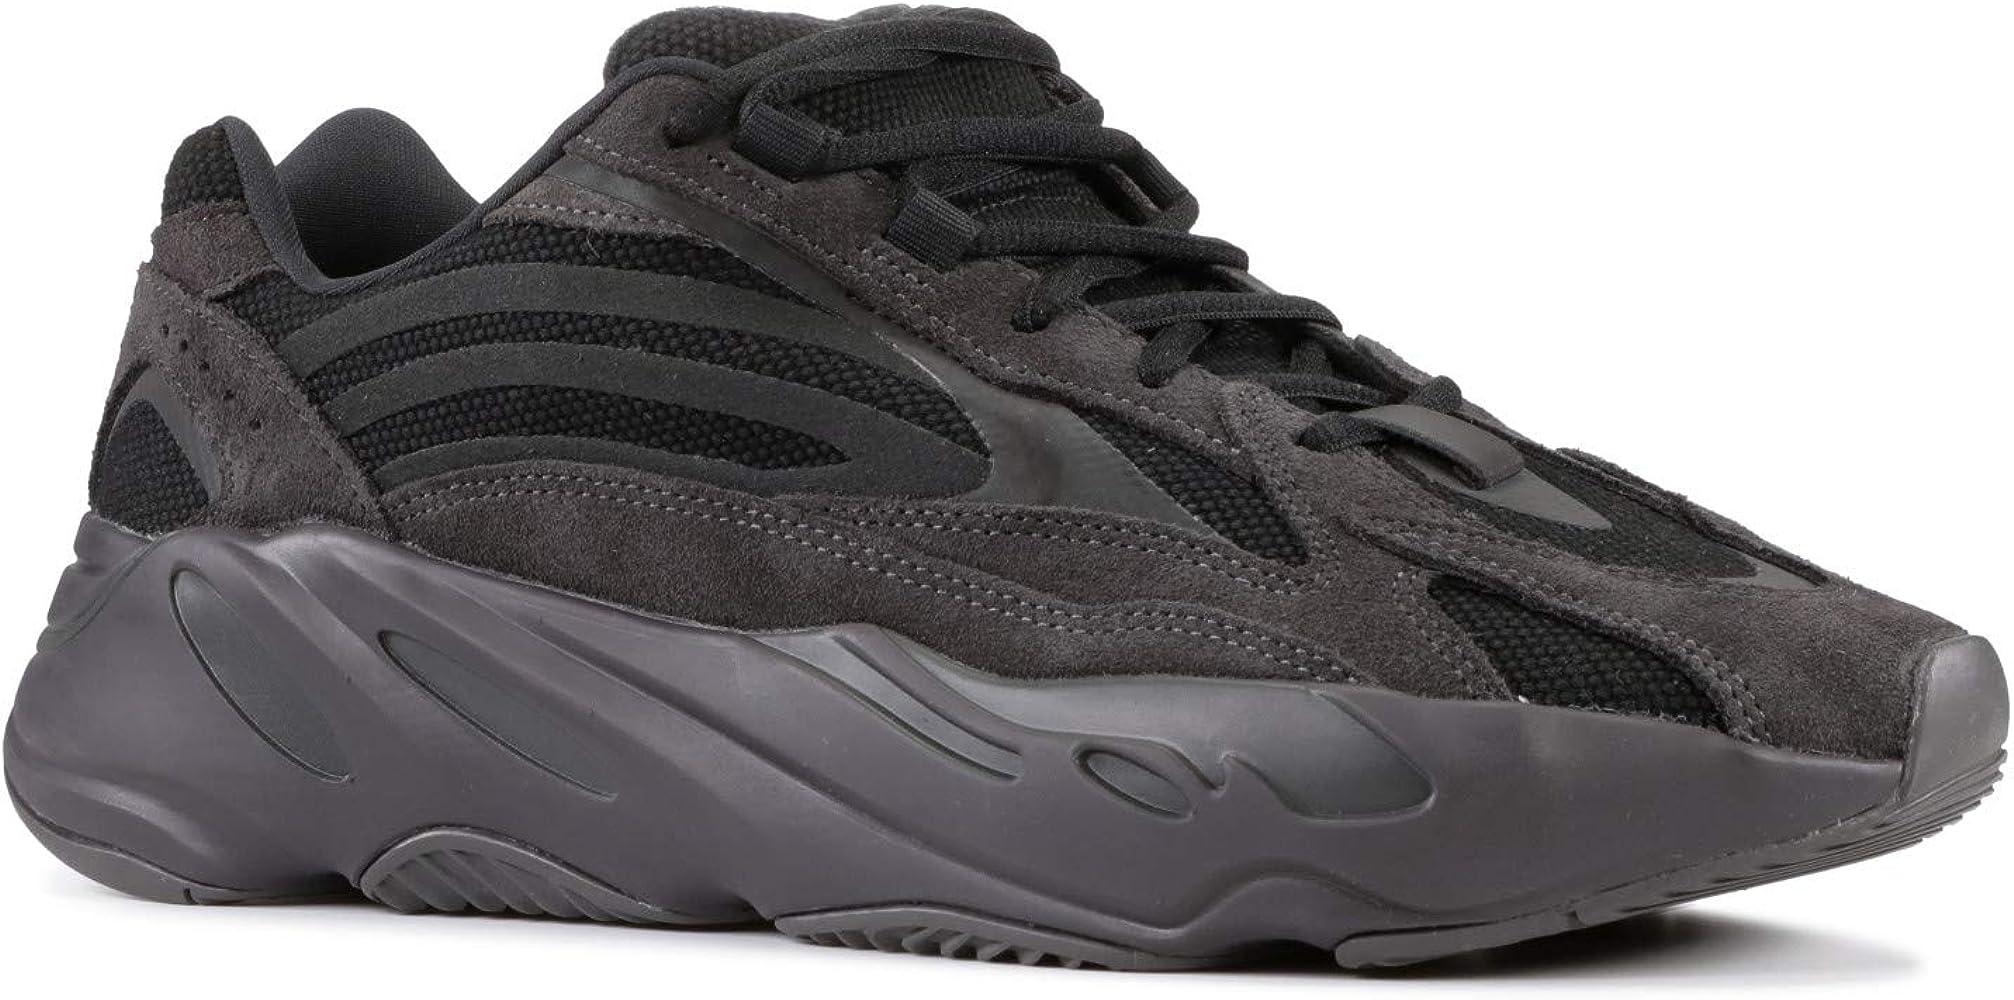 adidas Yeezy Boost 700 V2 Vanta | 43einhalb Sneaker Store